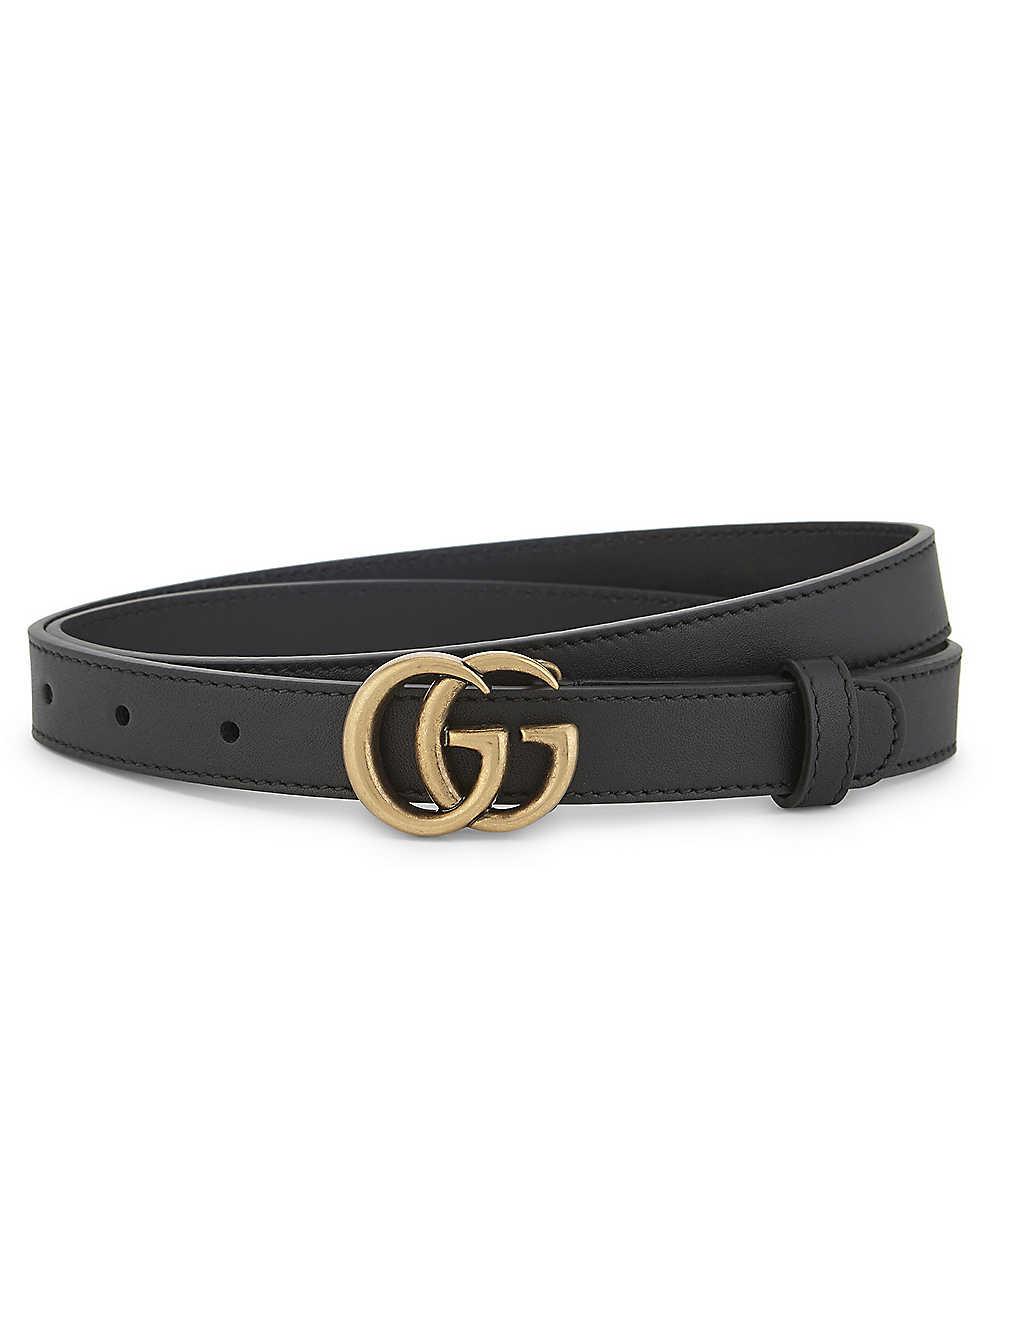 f630e3a19af GG buckle slim leather belt - Nero ...